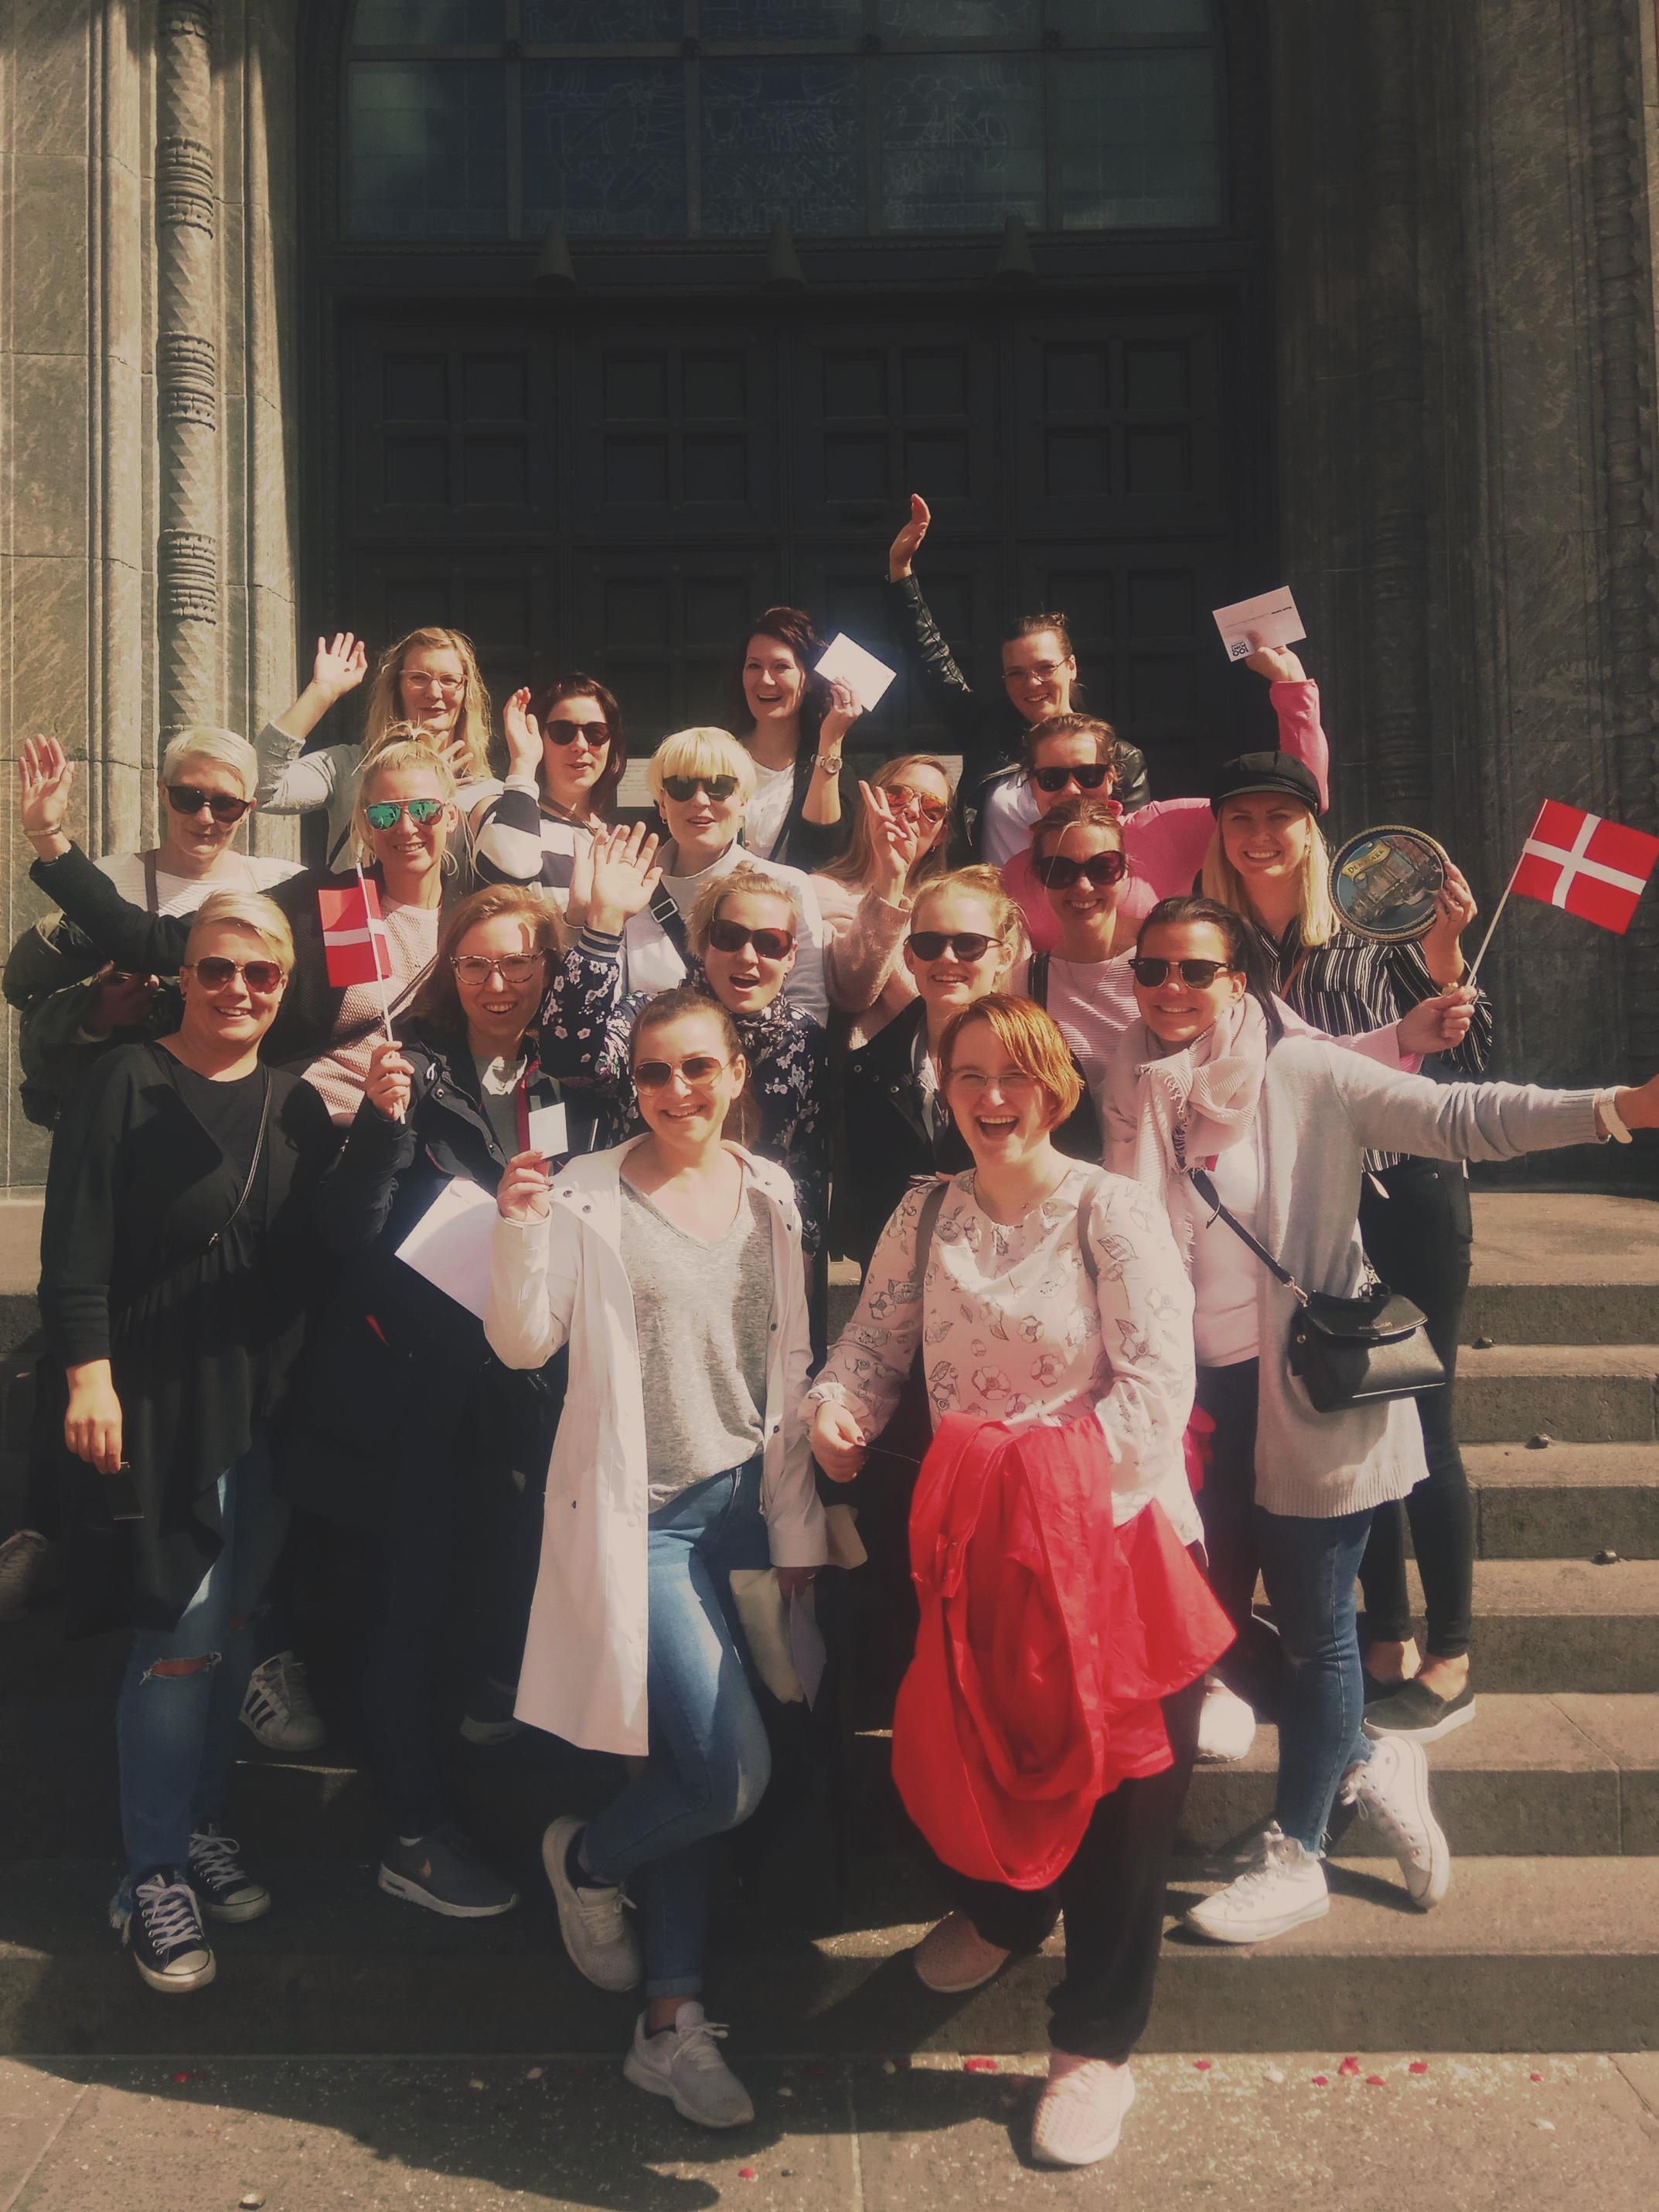 IMG_20190525_153620_1 - 100 Point Challenge Copenhagen.jpg